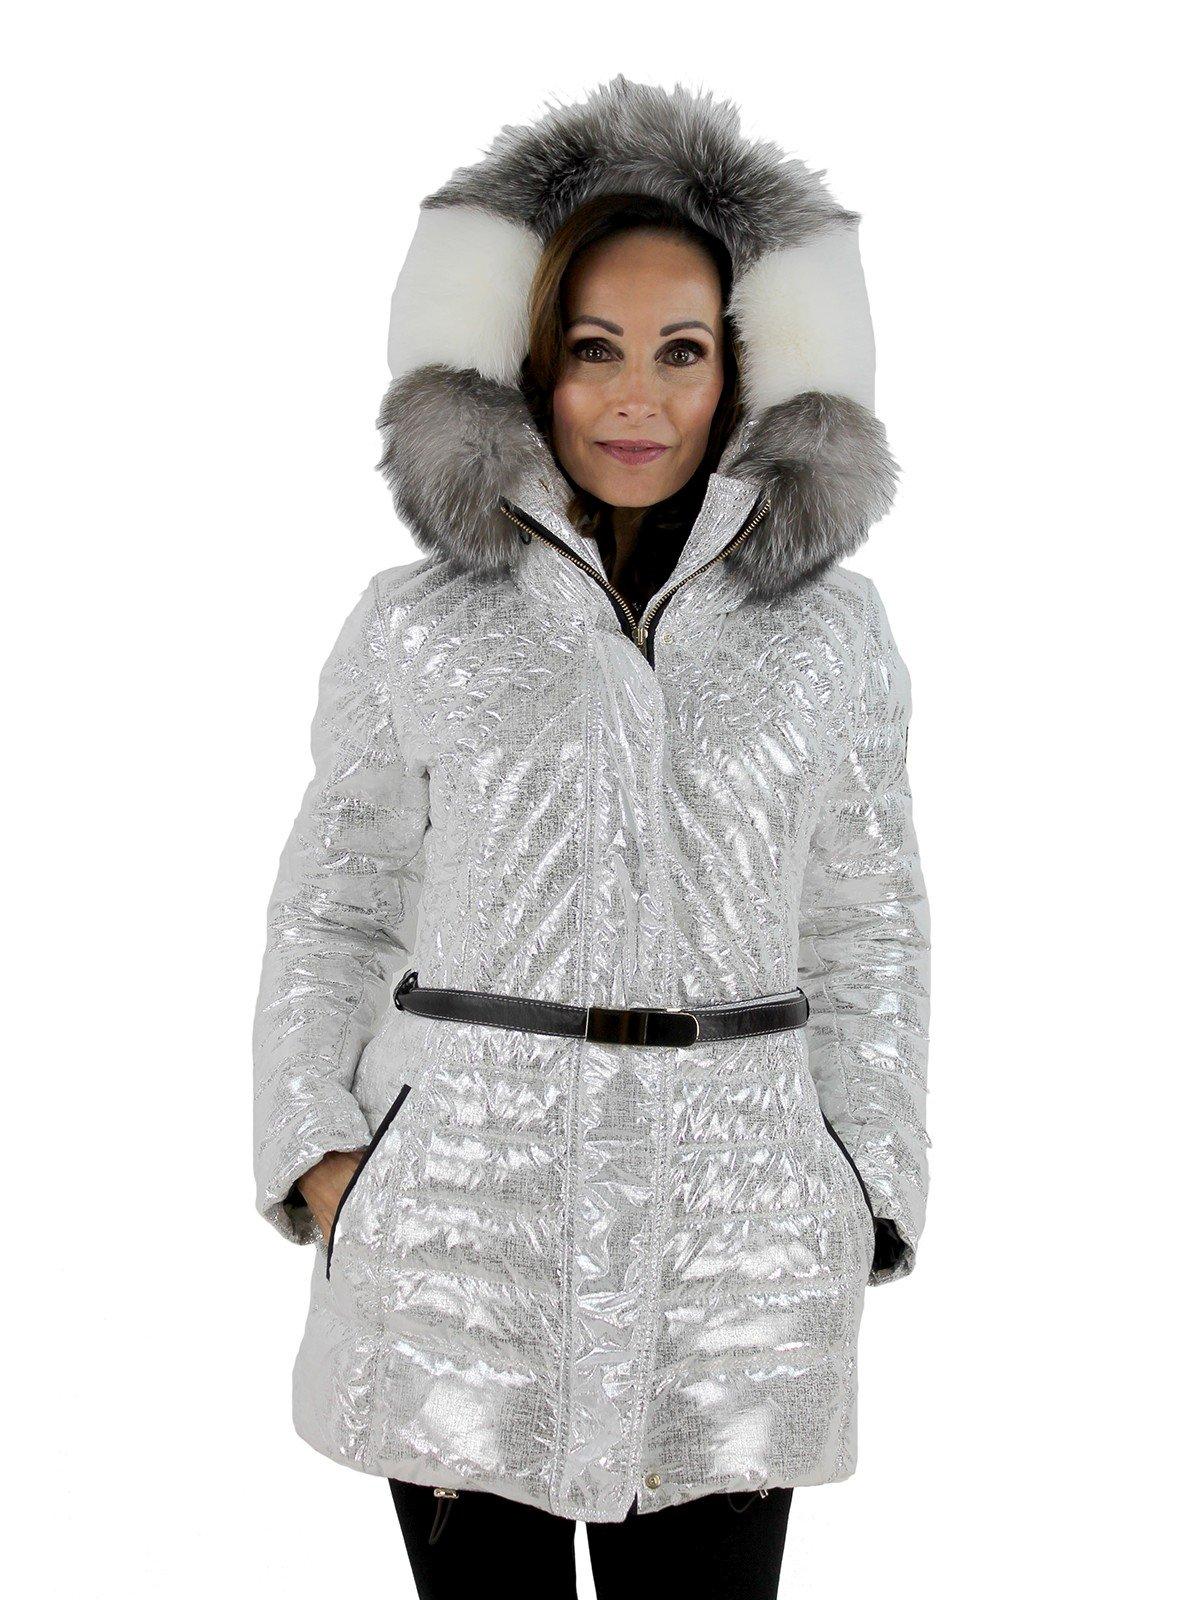 Gorski Woman's  Platinum Apres Ski Parka with Detachable Fox Fur Trim Hood